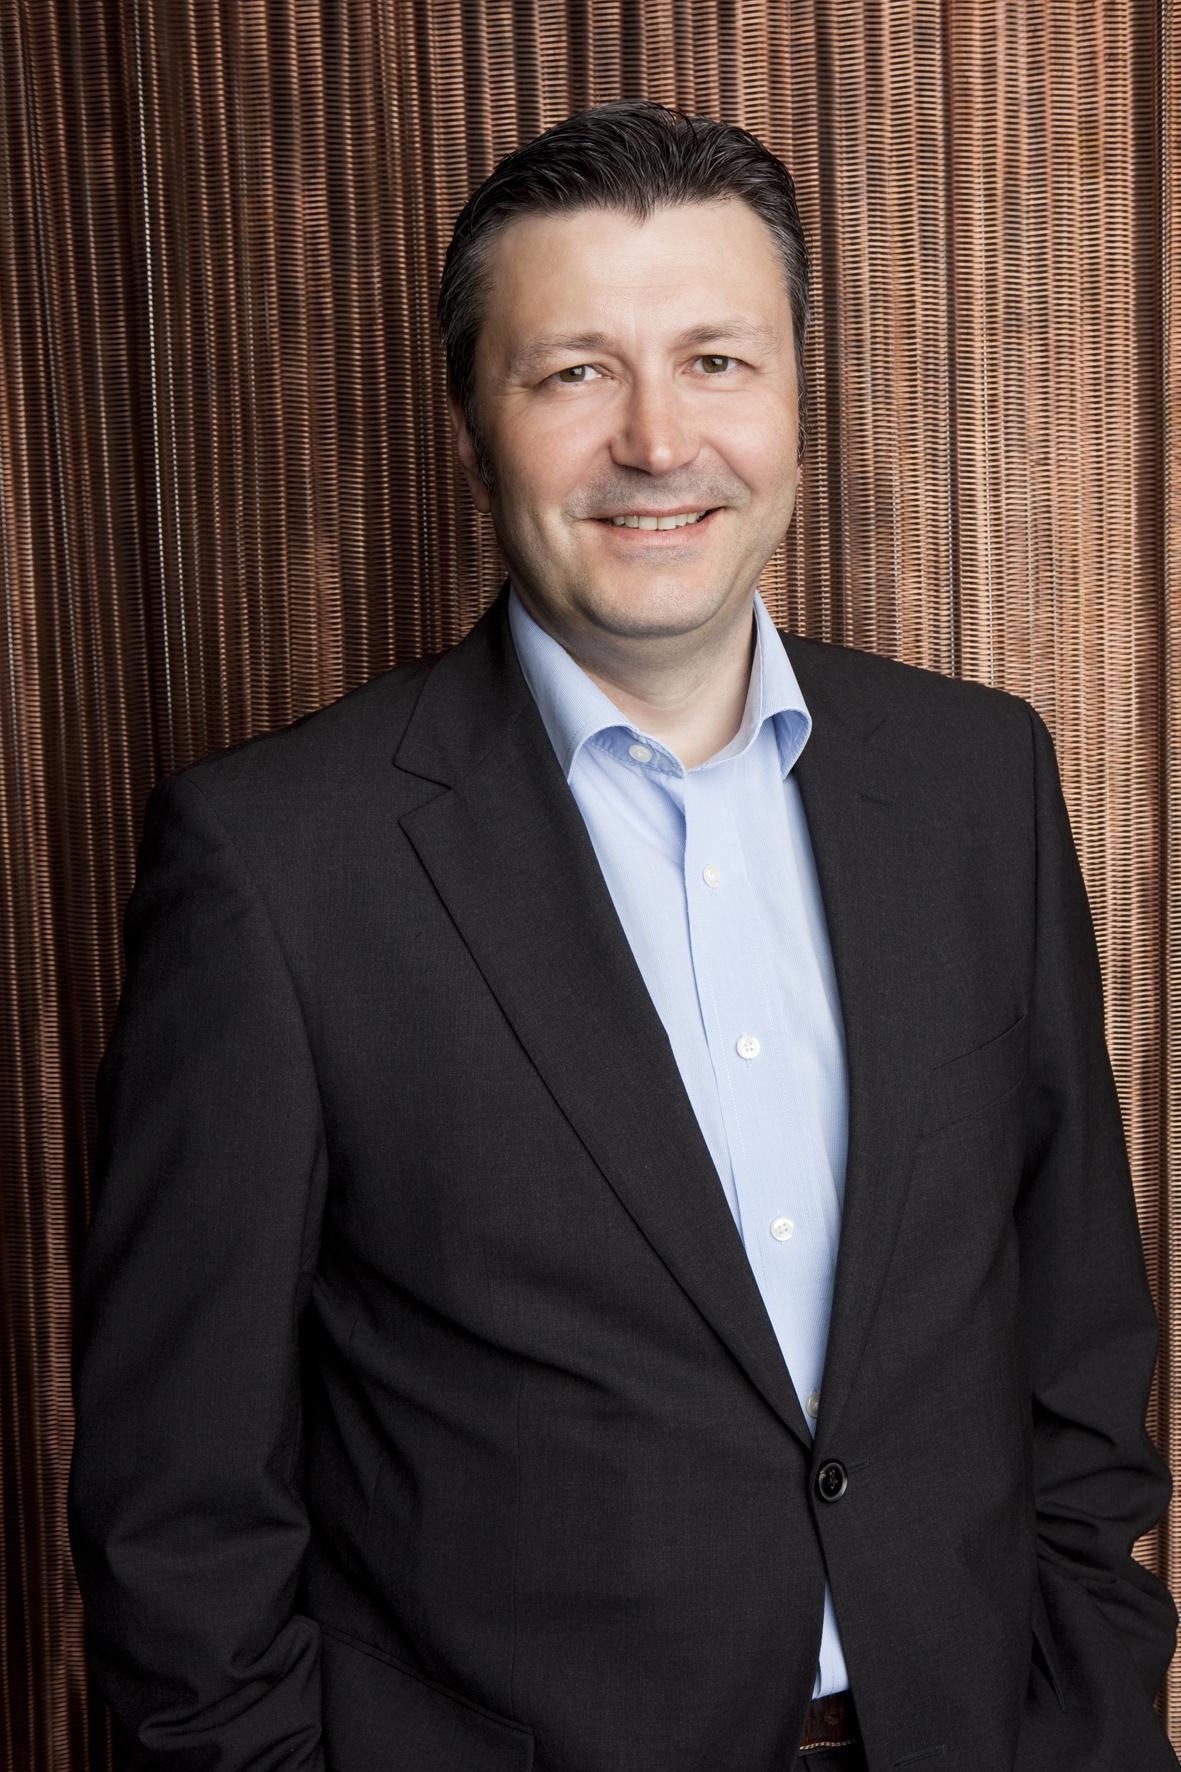 New VP for Scandic Norway